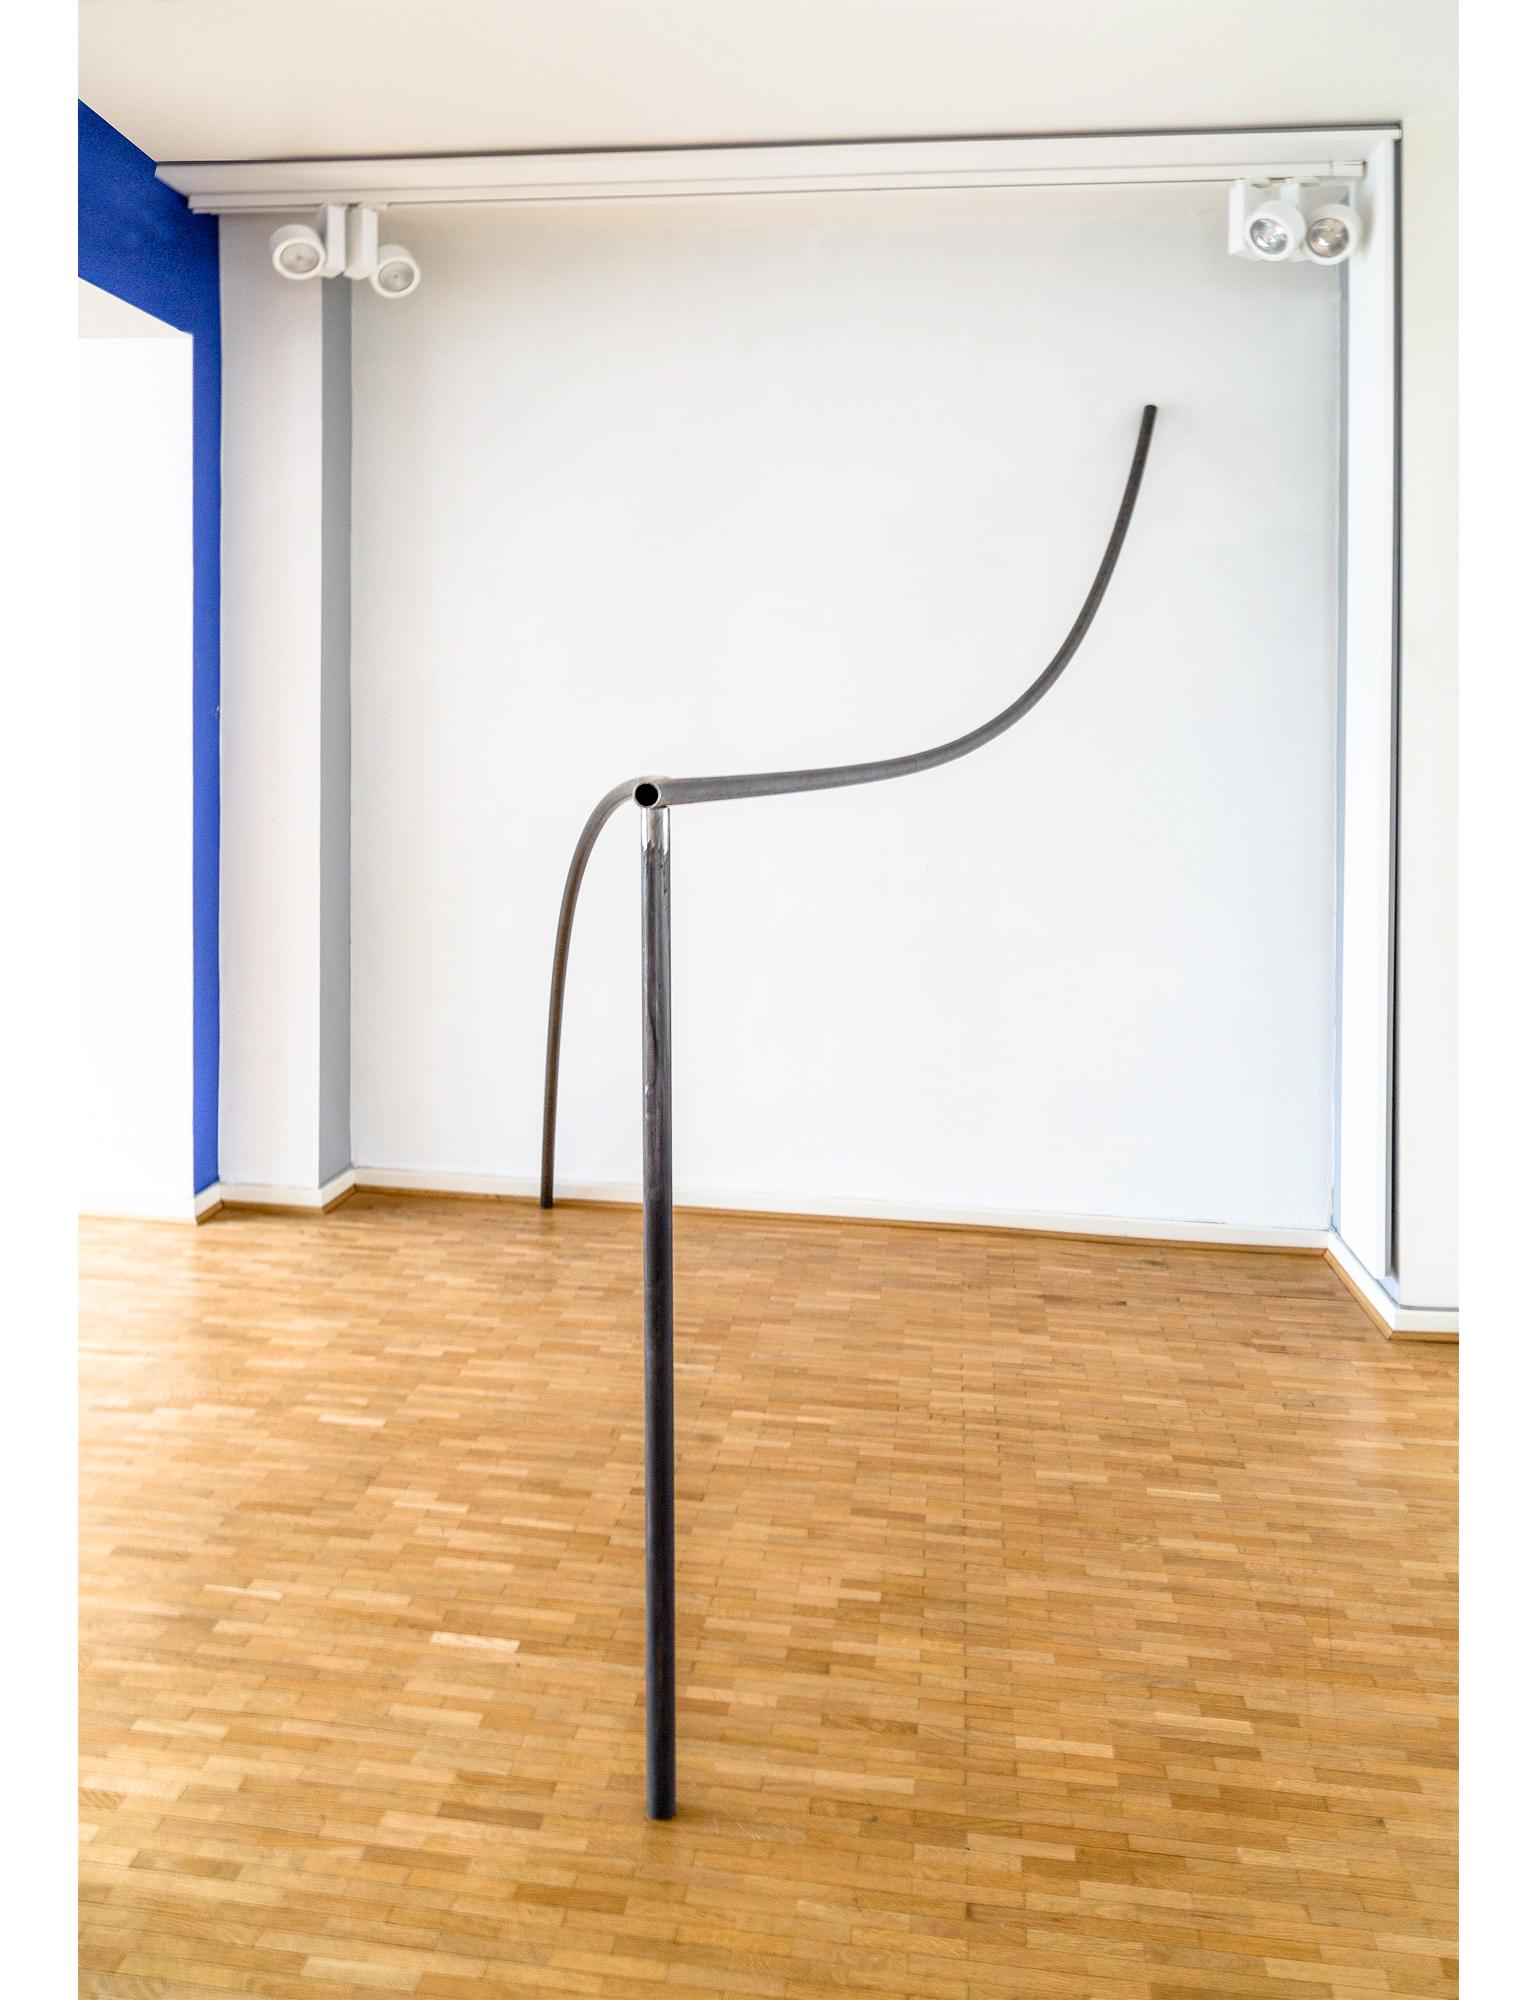 Steve-de-vriendt-atelier-jespers08.jpg